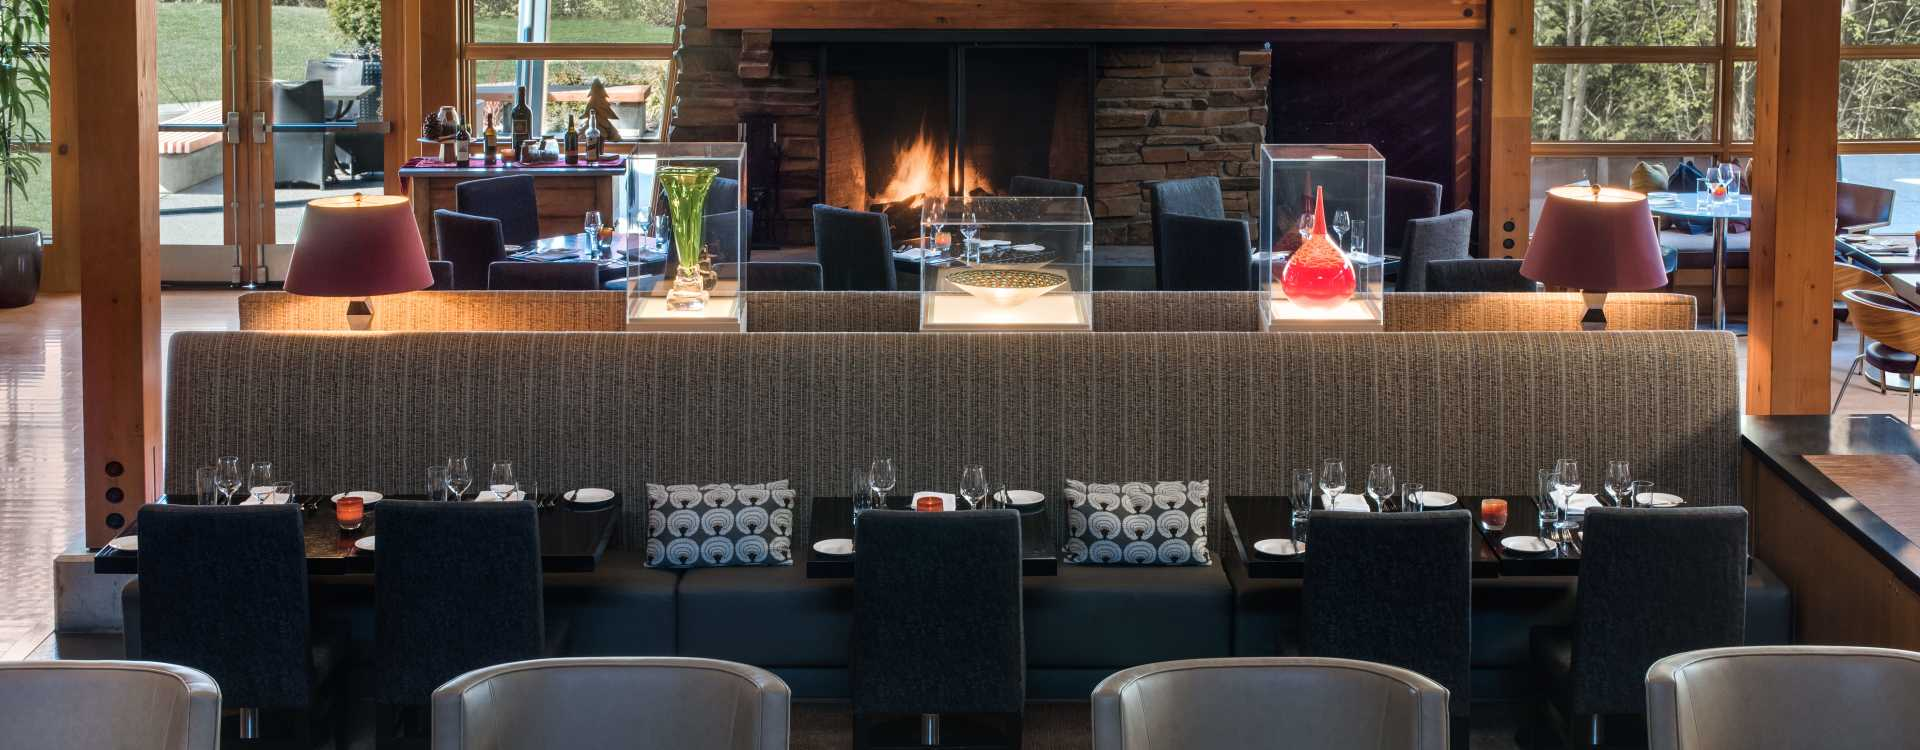 Copperleaf Restaurant Dining Room